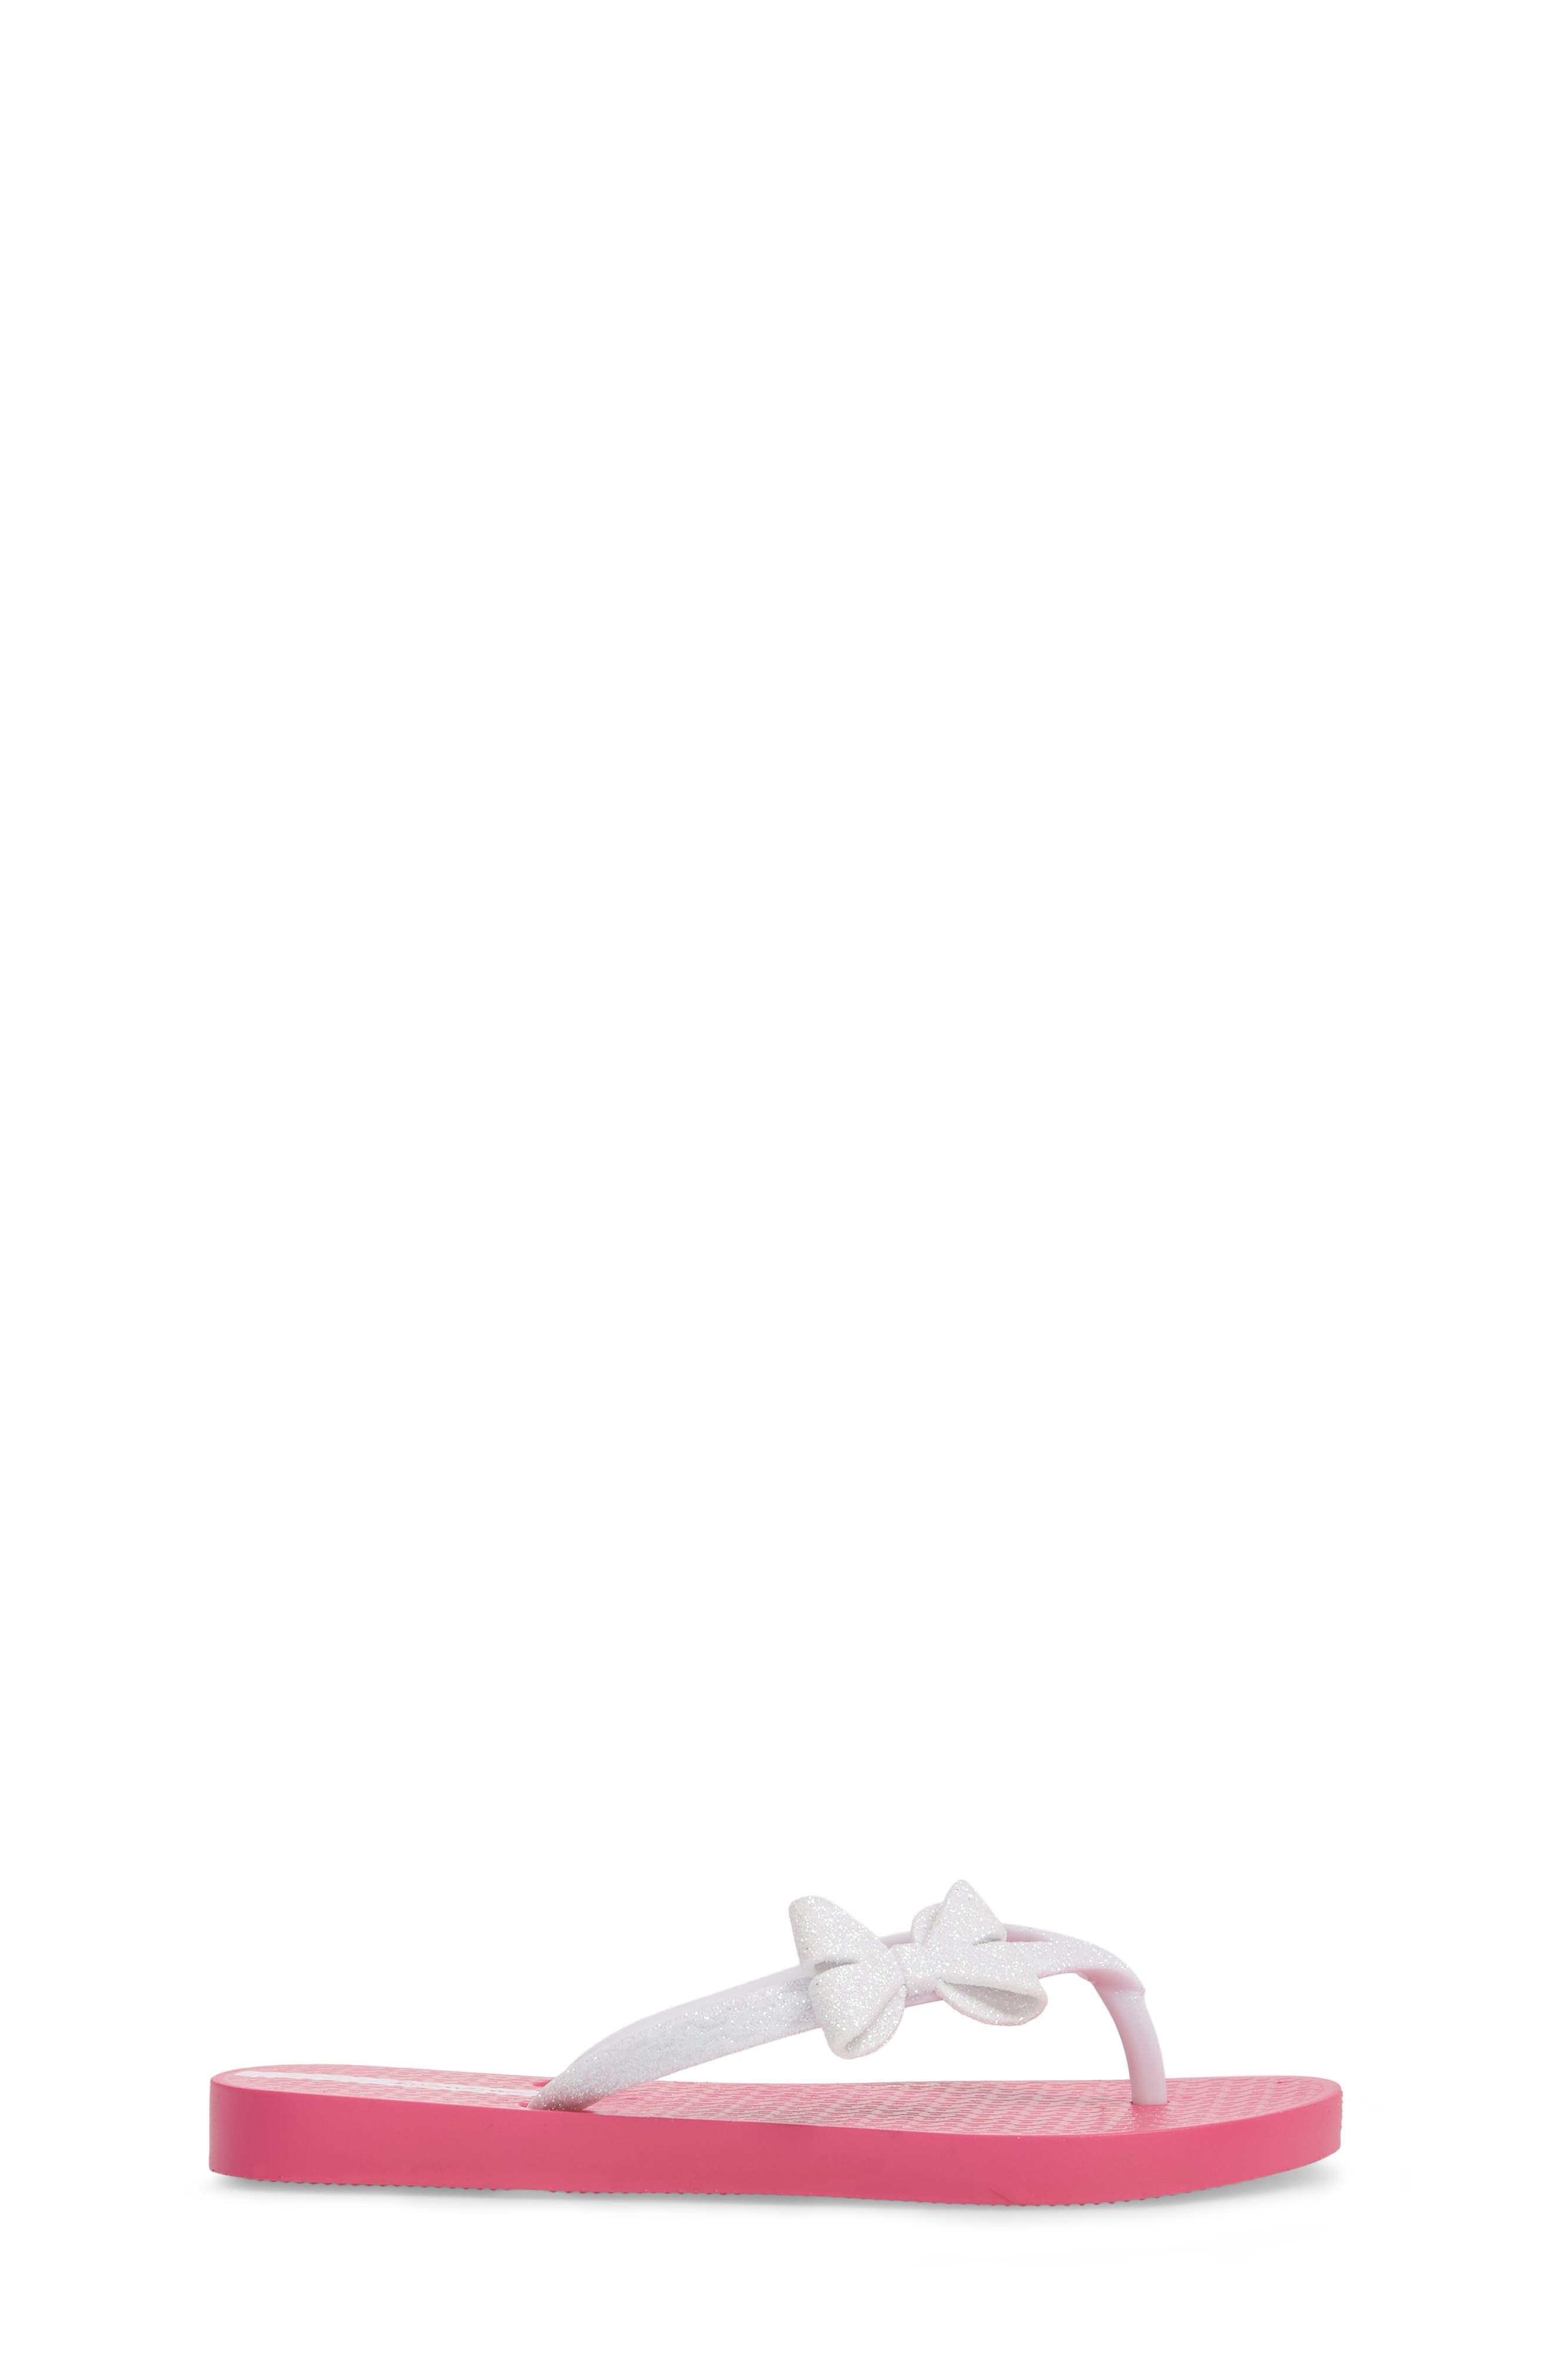 IPANEMA, Glitter IV Flip Flop, Alternate thumbnail 3, color, PINK/ WHITE